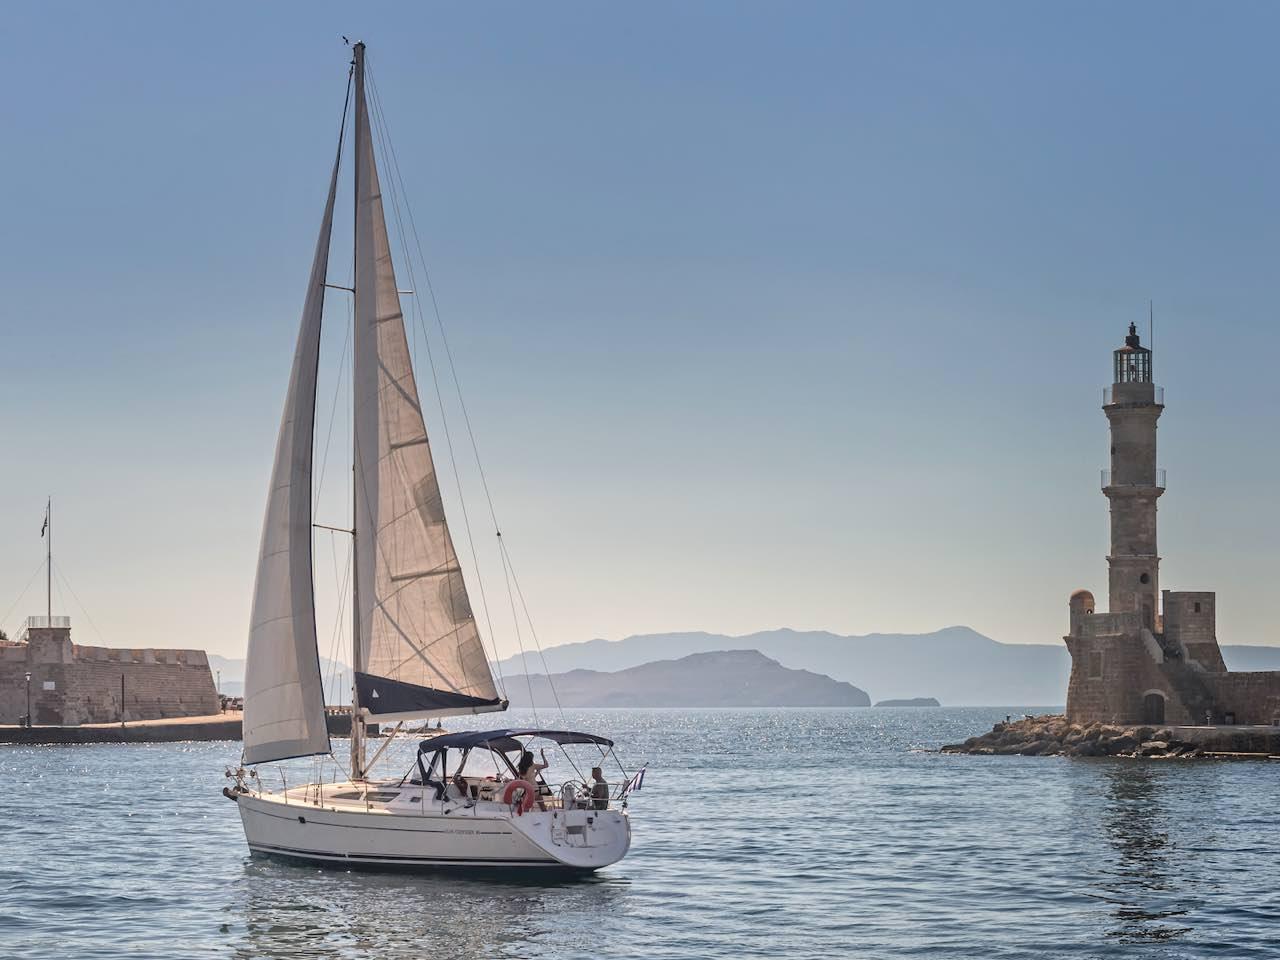 Sea Breezes, A Dramatic Shoreline, Secret Beaches - Sailing Trip Chania Crete